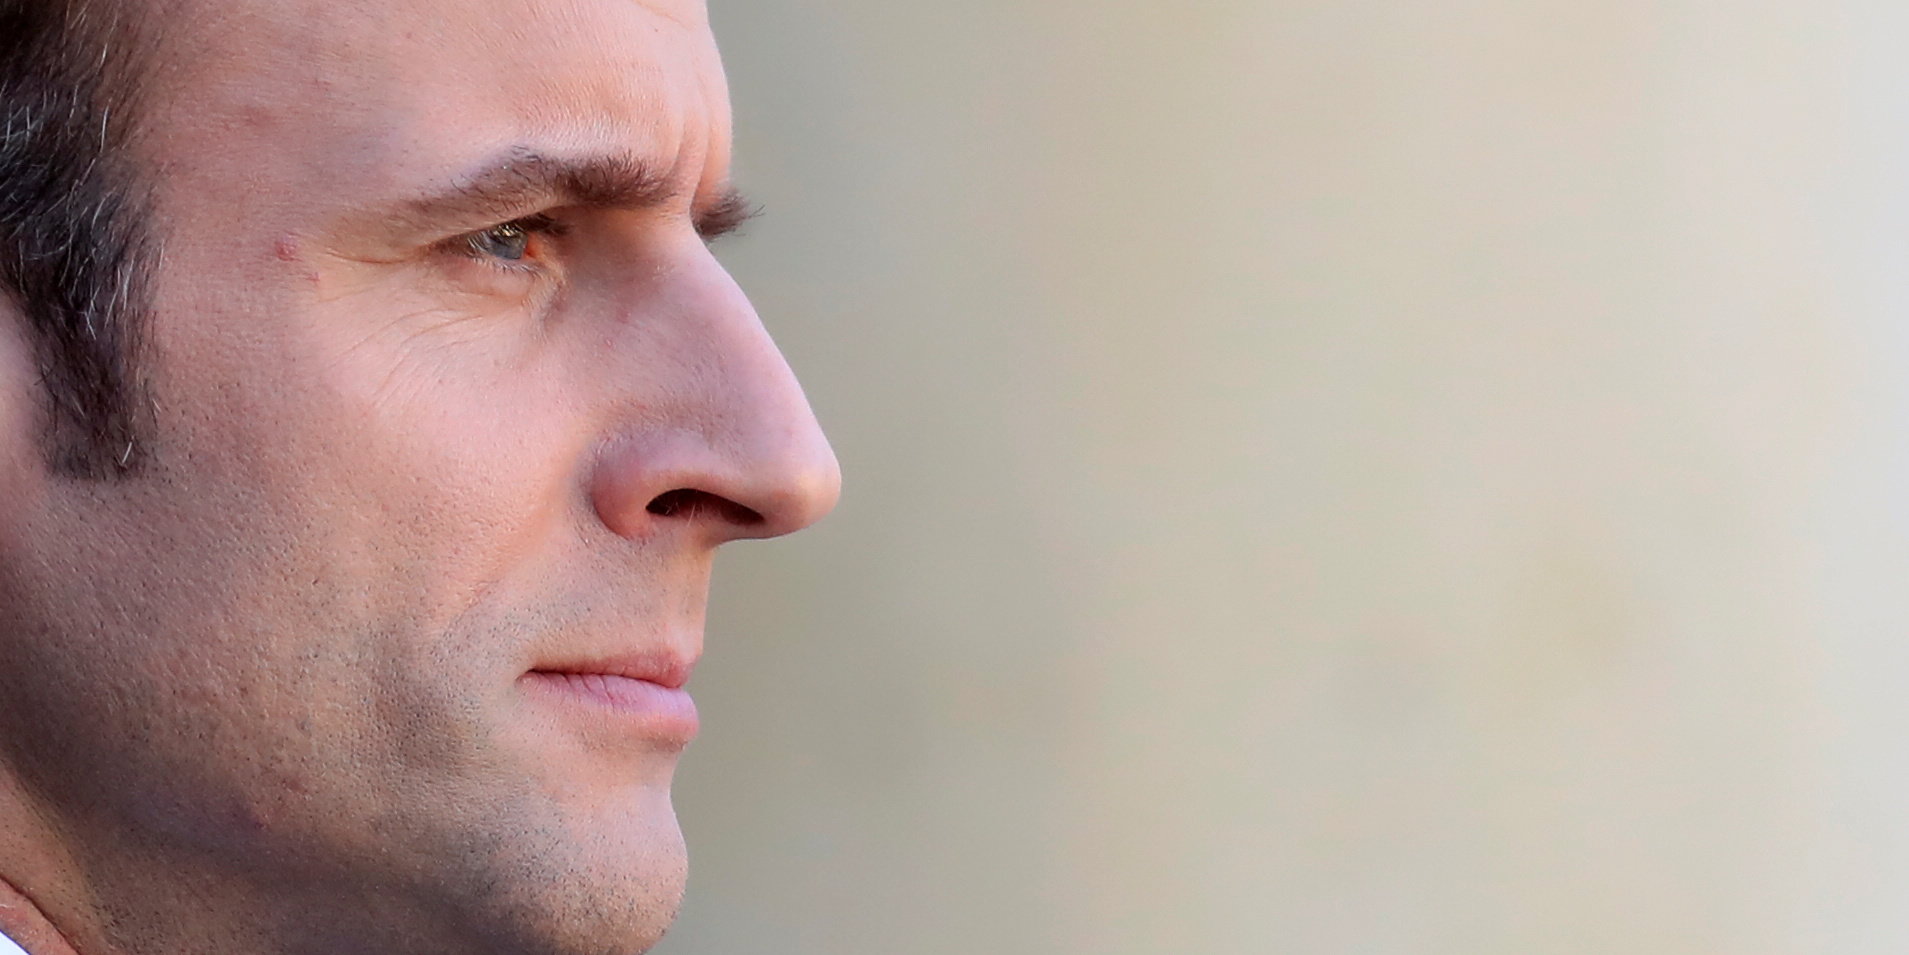 La popularité de Macron s'enraye